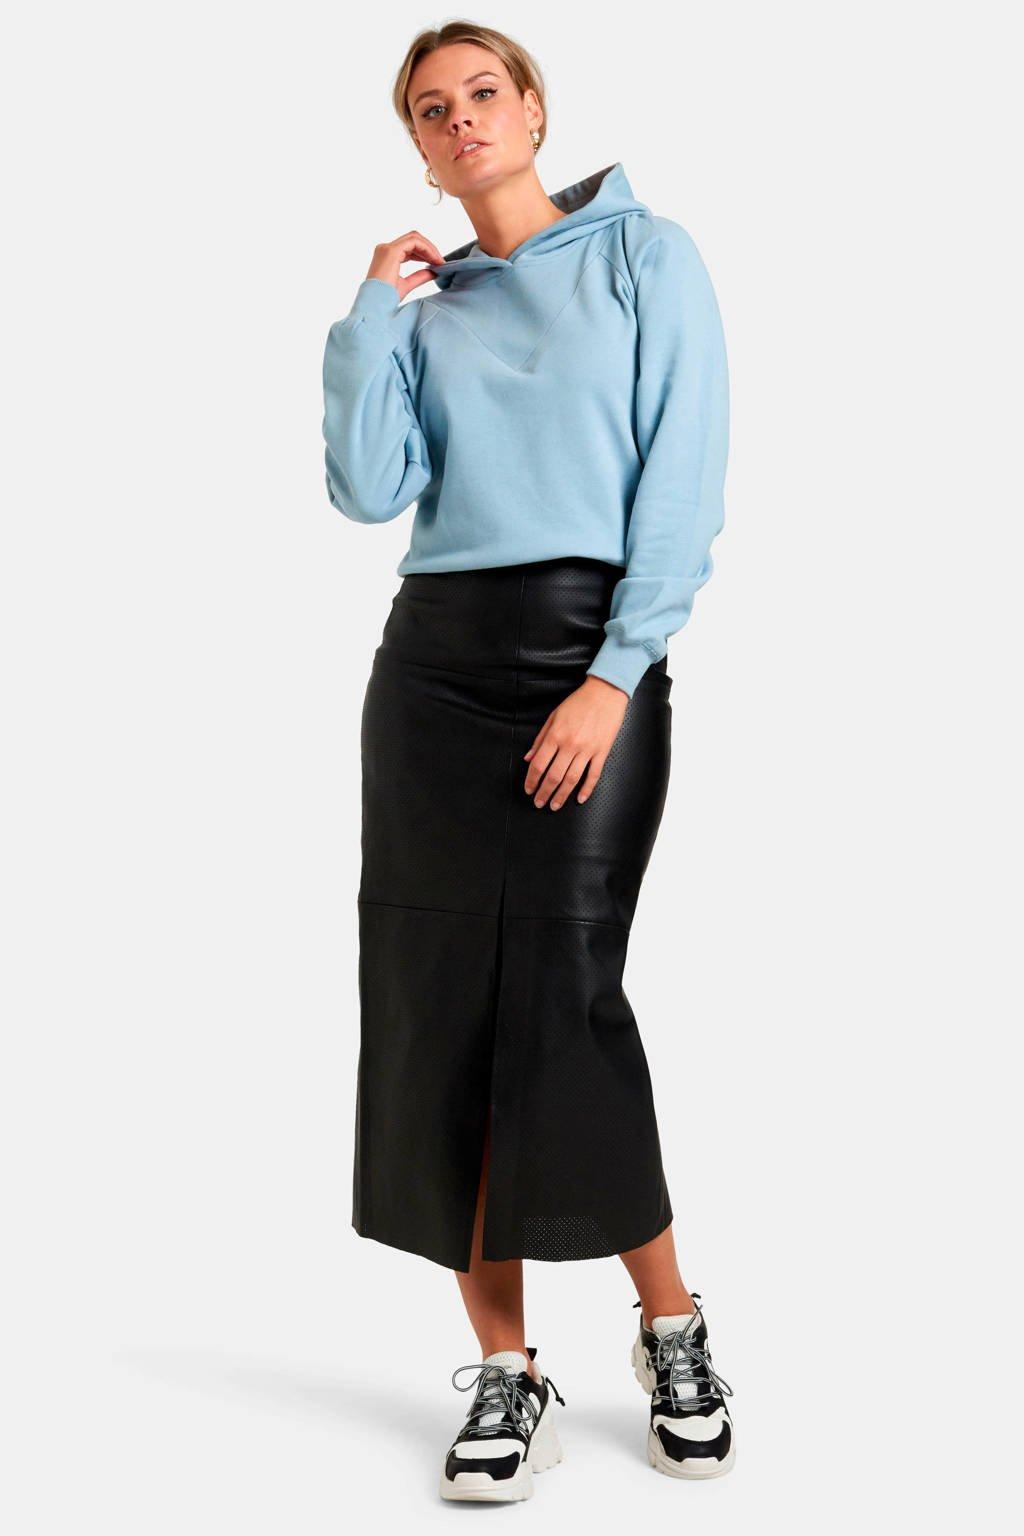 Eksept by Shoeby hoodie Lexie met printopdruk lichtblauw, Lichtblauw